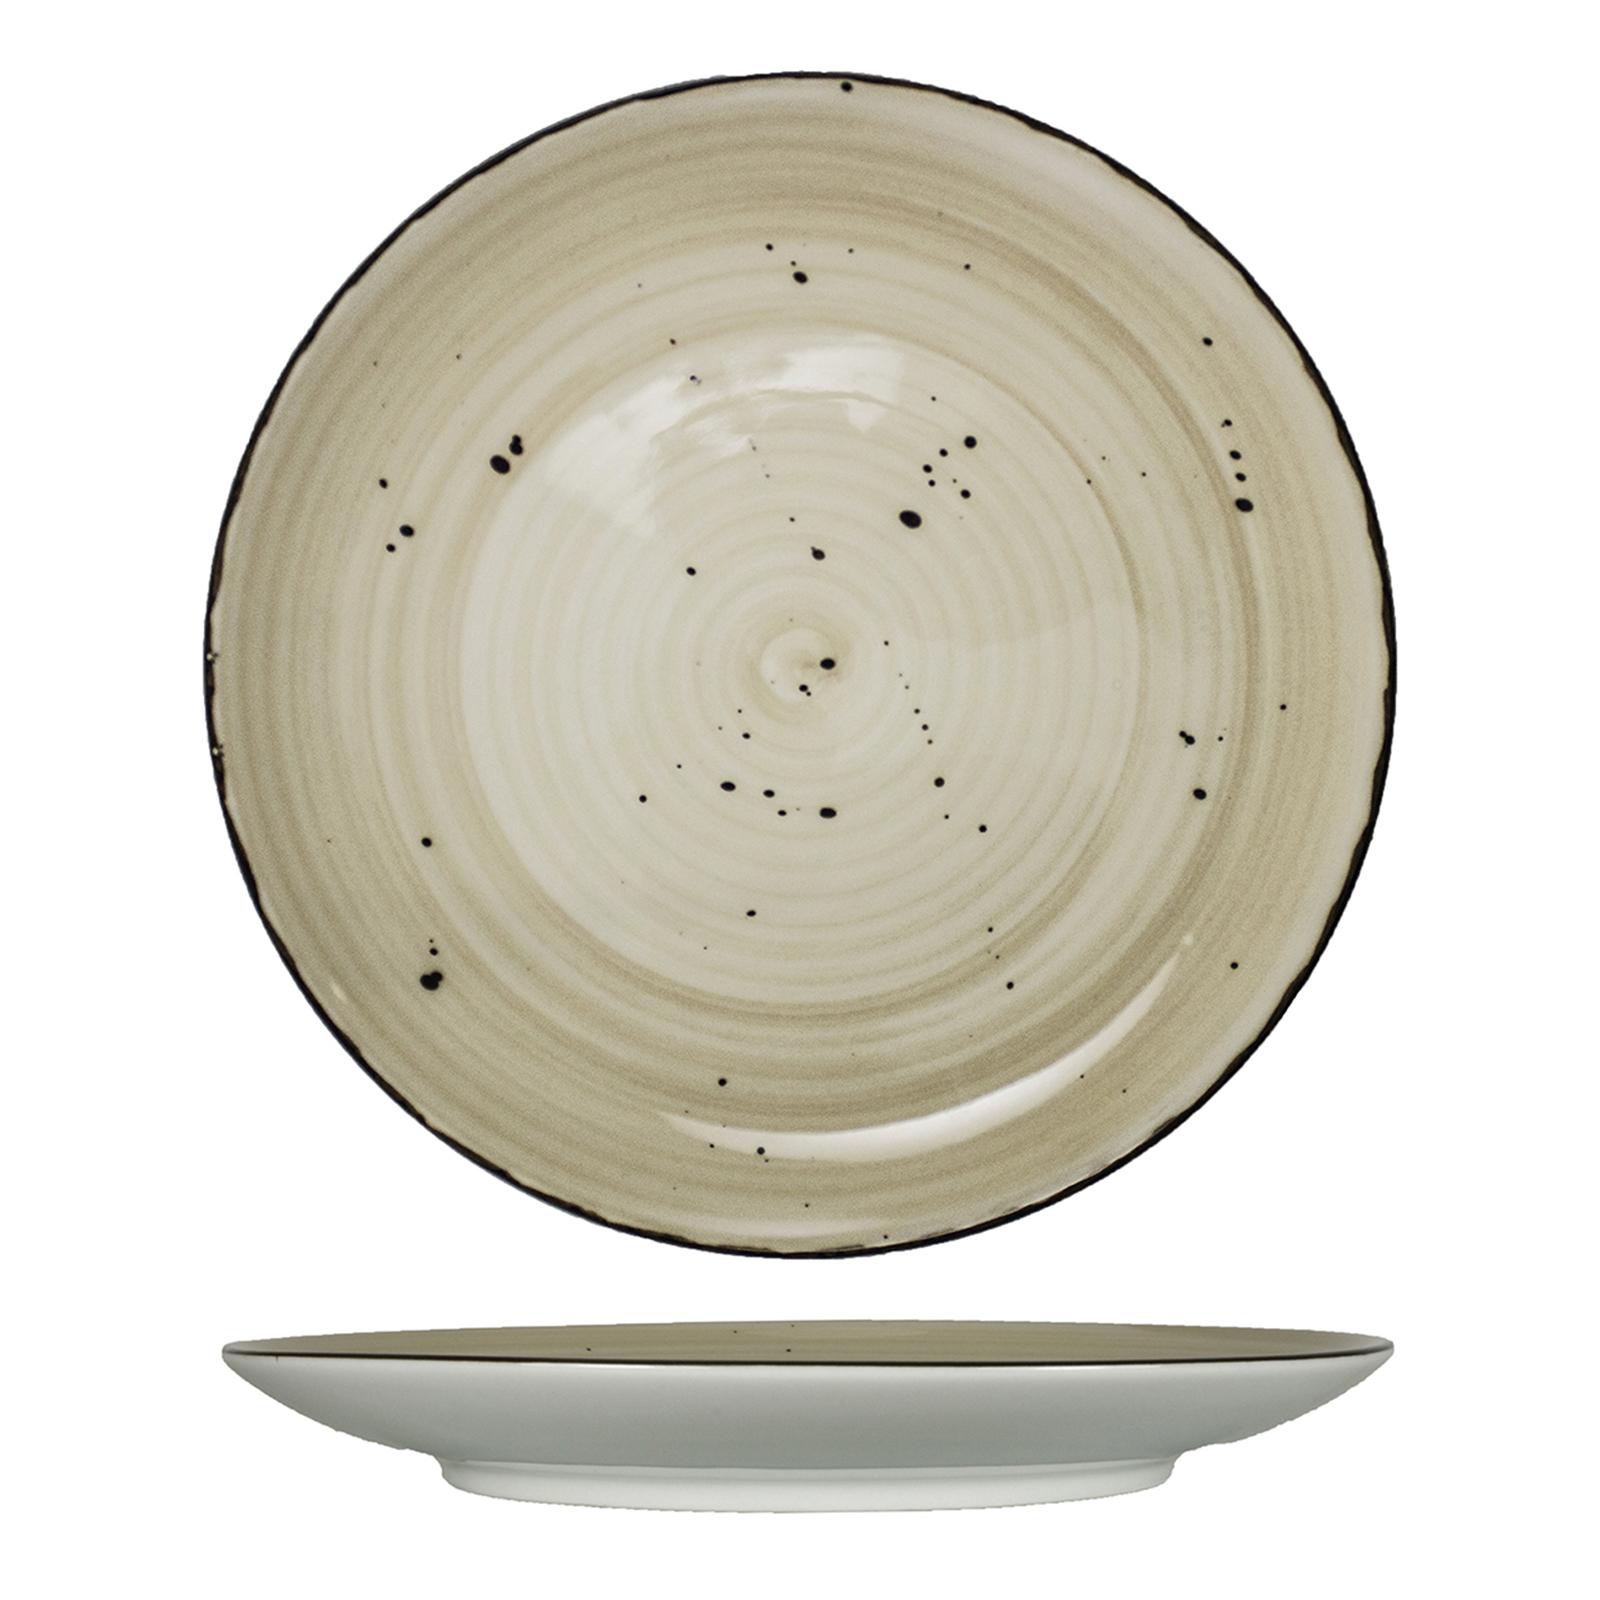 International Tableware RT-8-WH plate, china